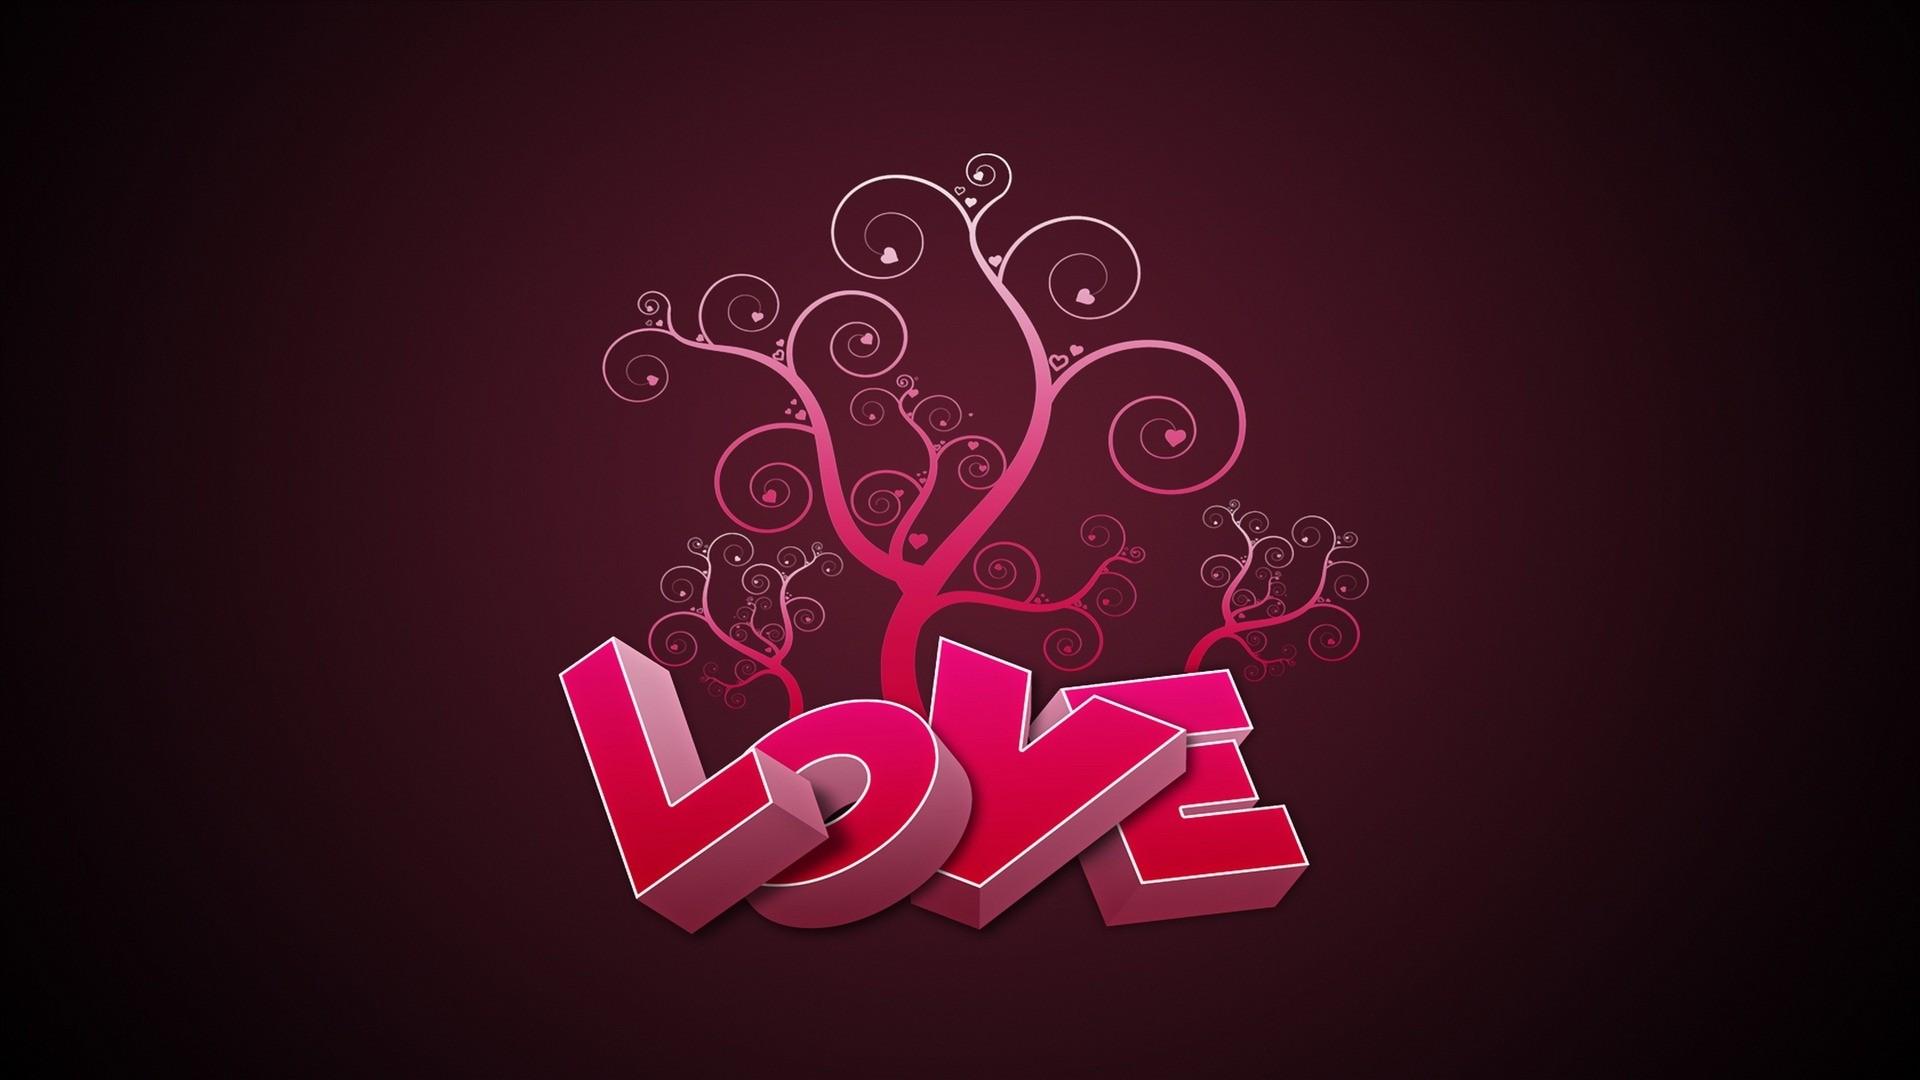 Full HD p Love Wallpapers HD Desktop Backgrounds x